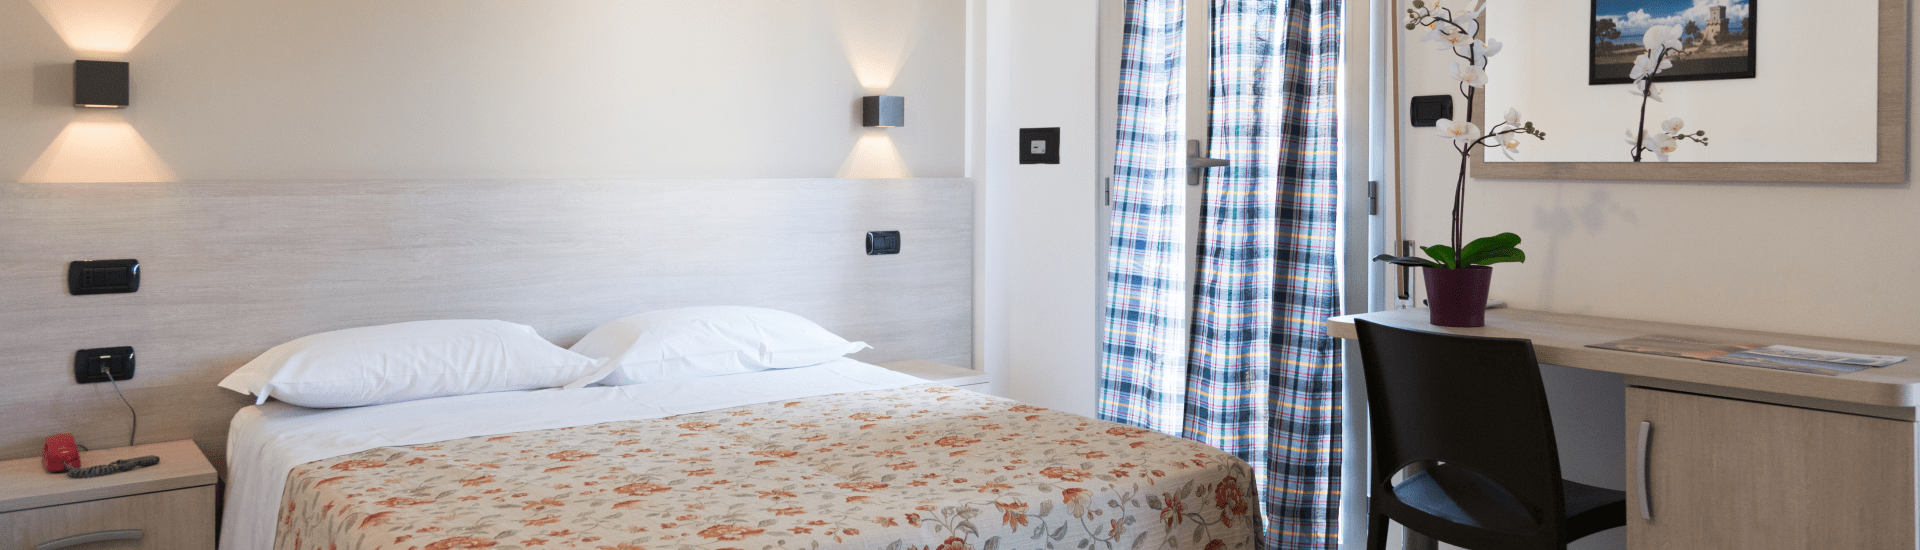 camere_hotel_saint_tropez_pineto-min